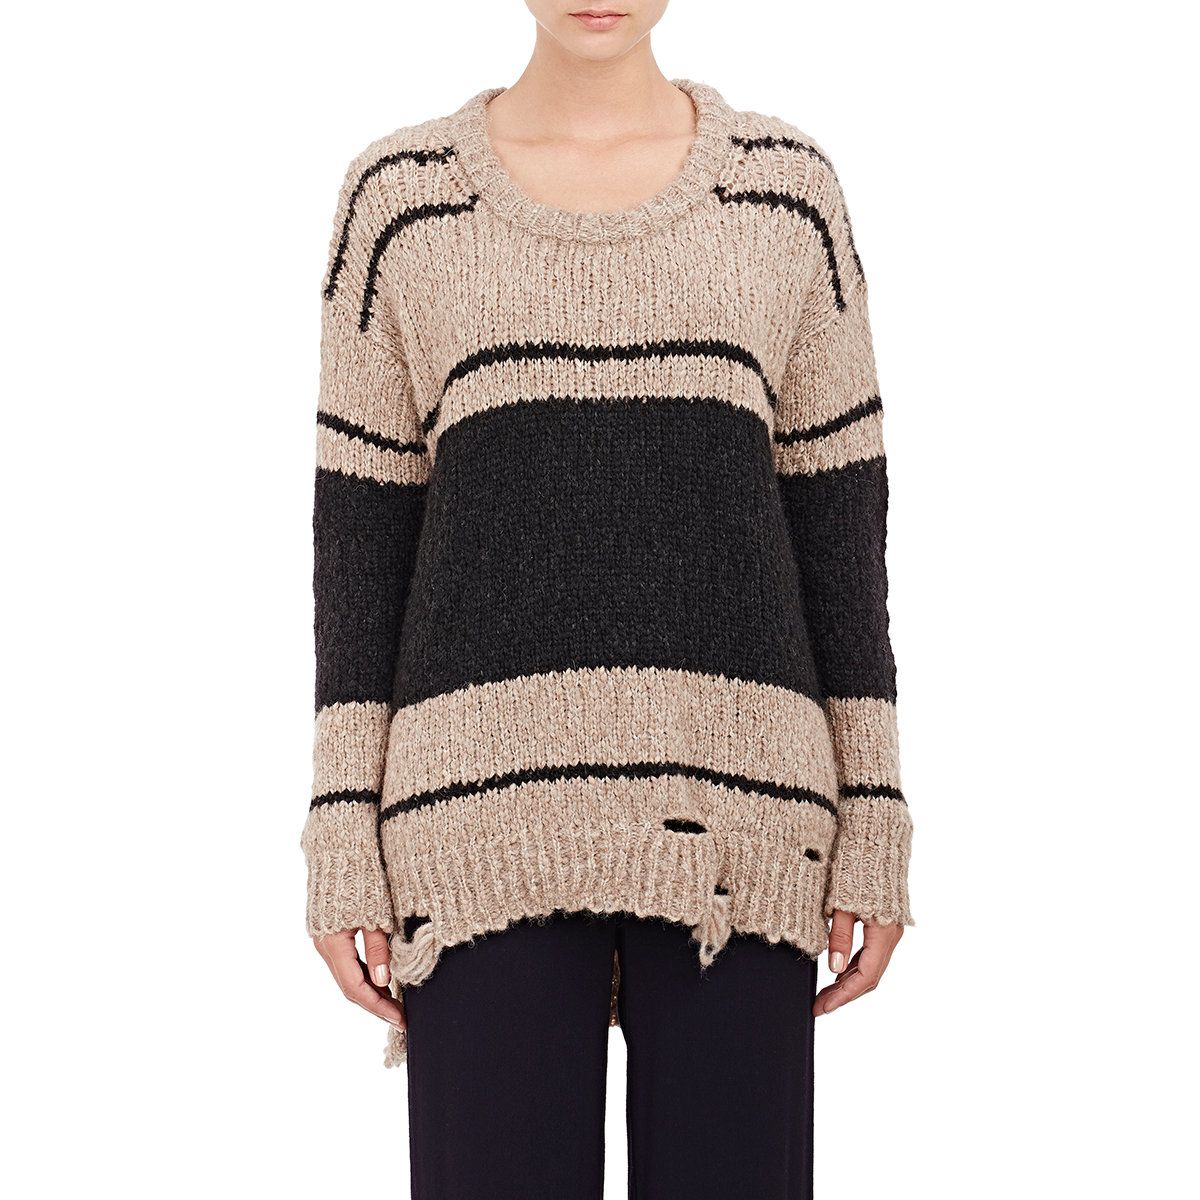 Raquel allegra Womens Distressed Chunky-knit Sweater in Black Lyst